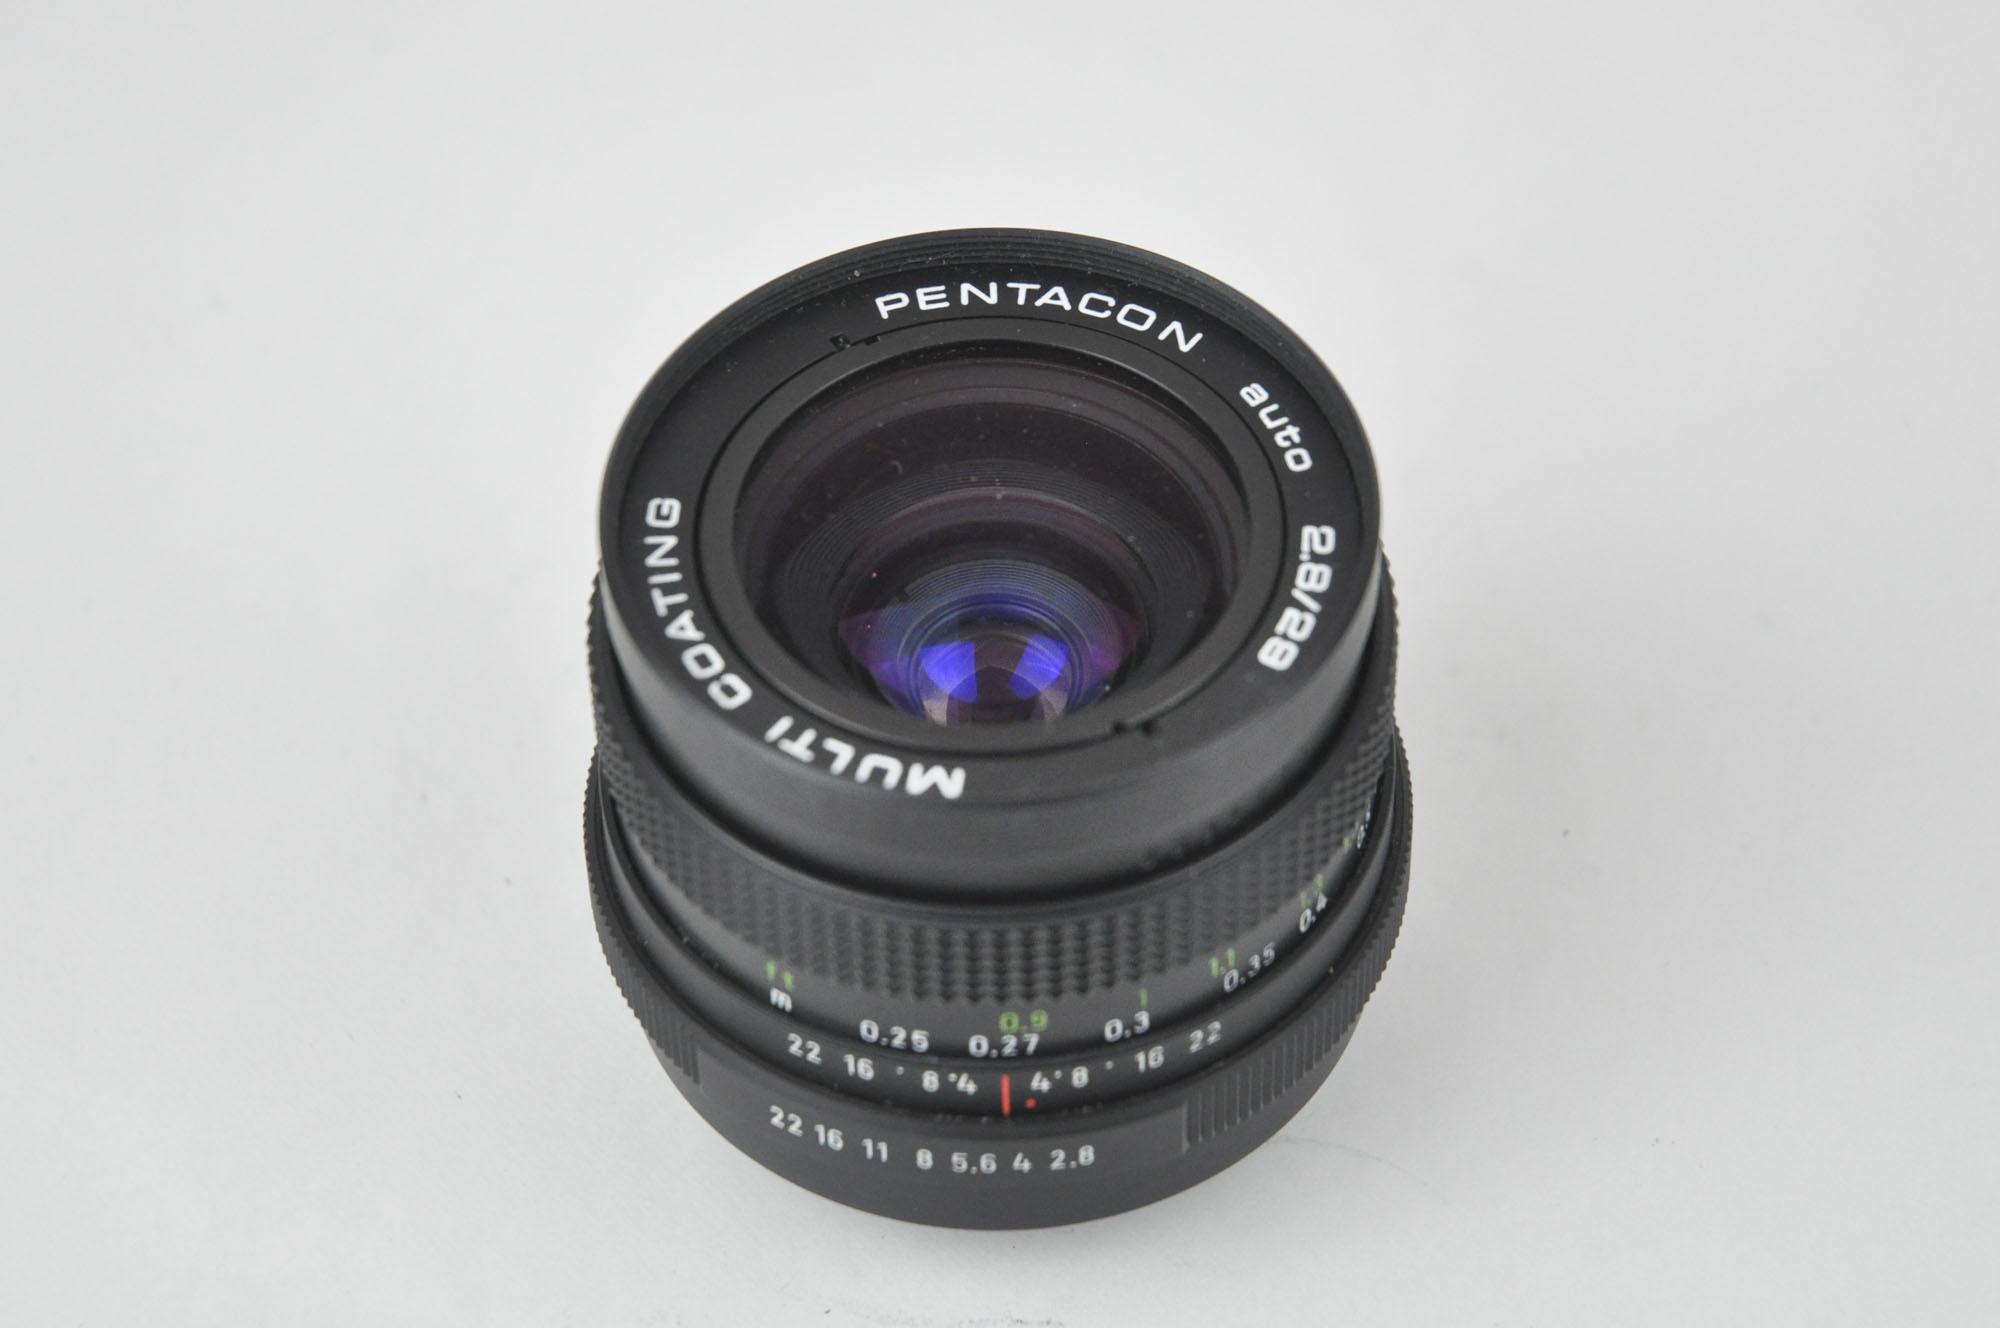 Pentacon Multi Coating 29mm f2.8